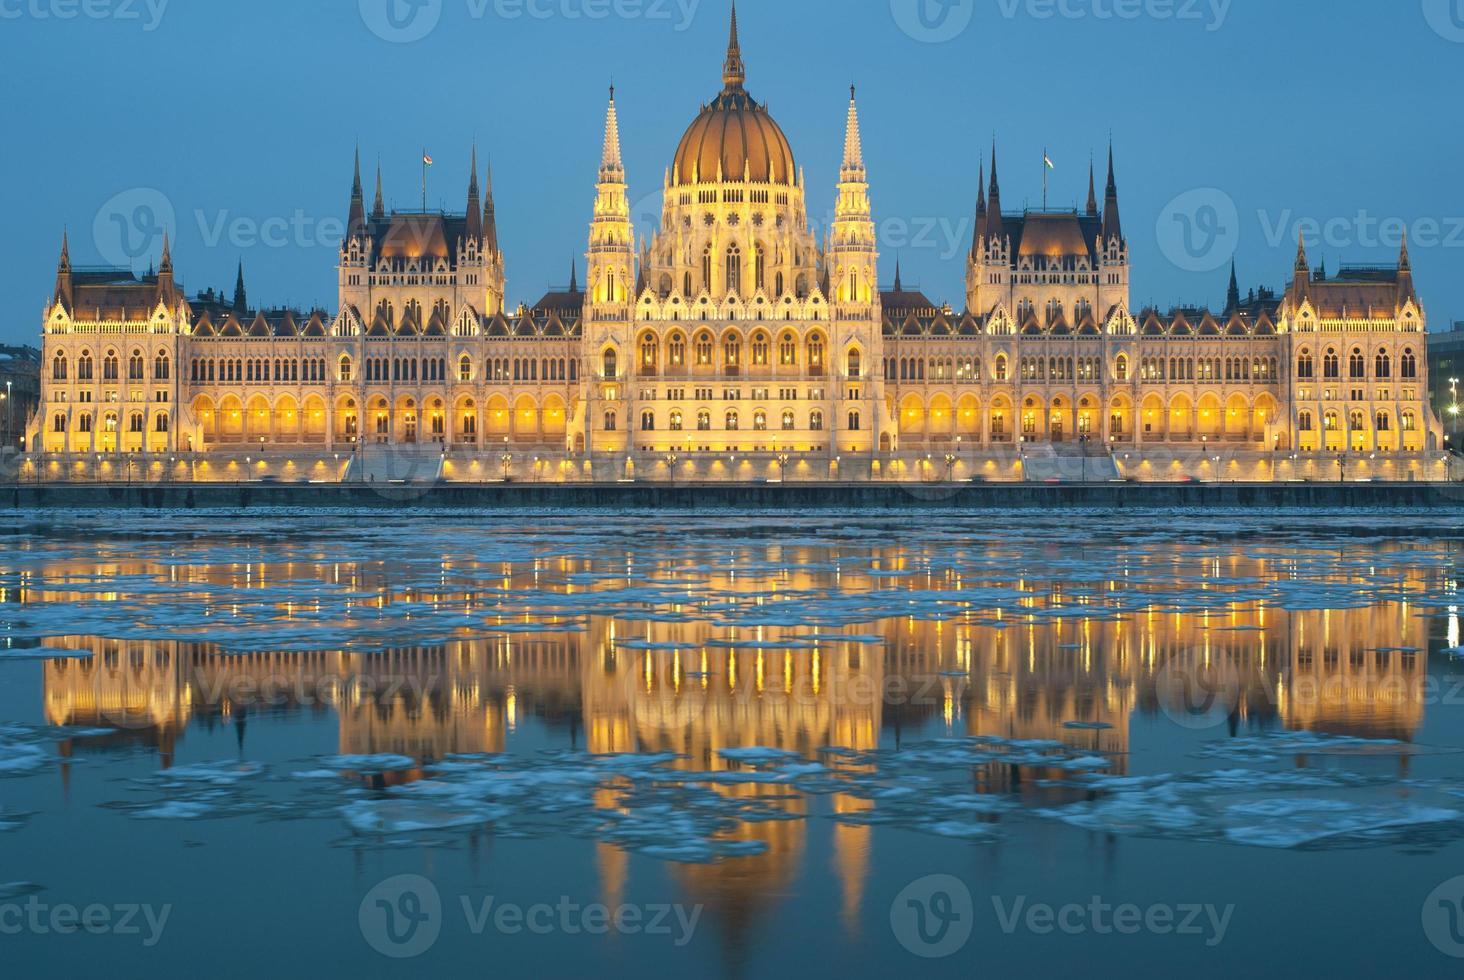 Hongaarse parlement 's nachts, winter foto